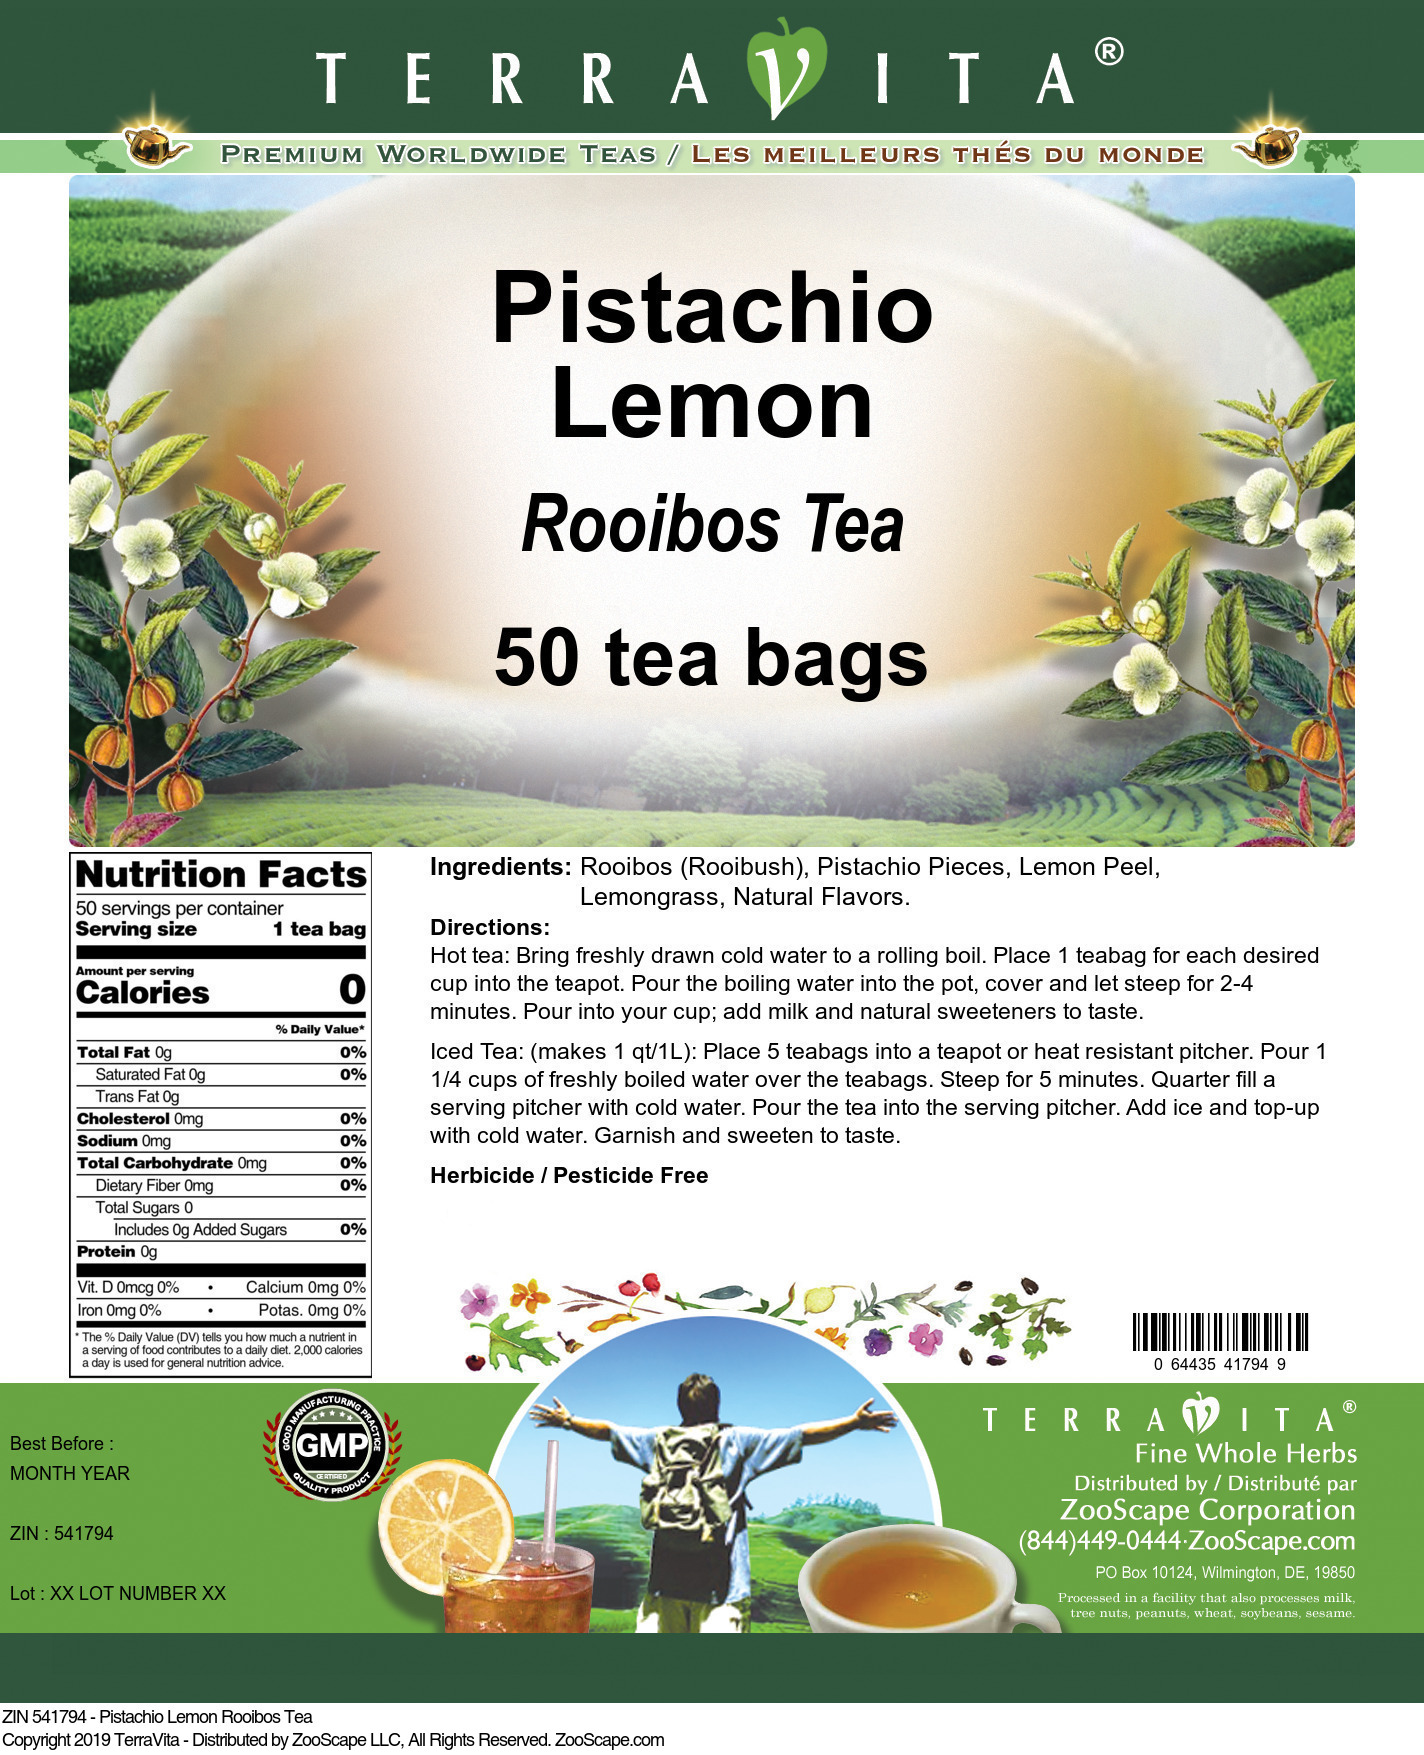 Pistachio Lemon Rooibos Tea